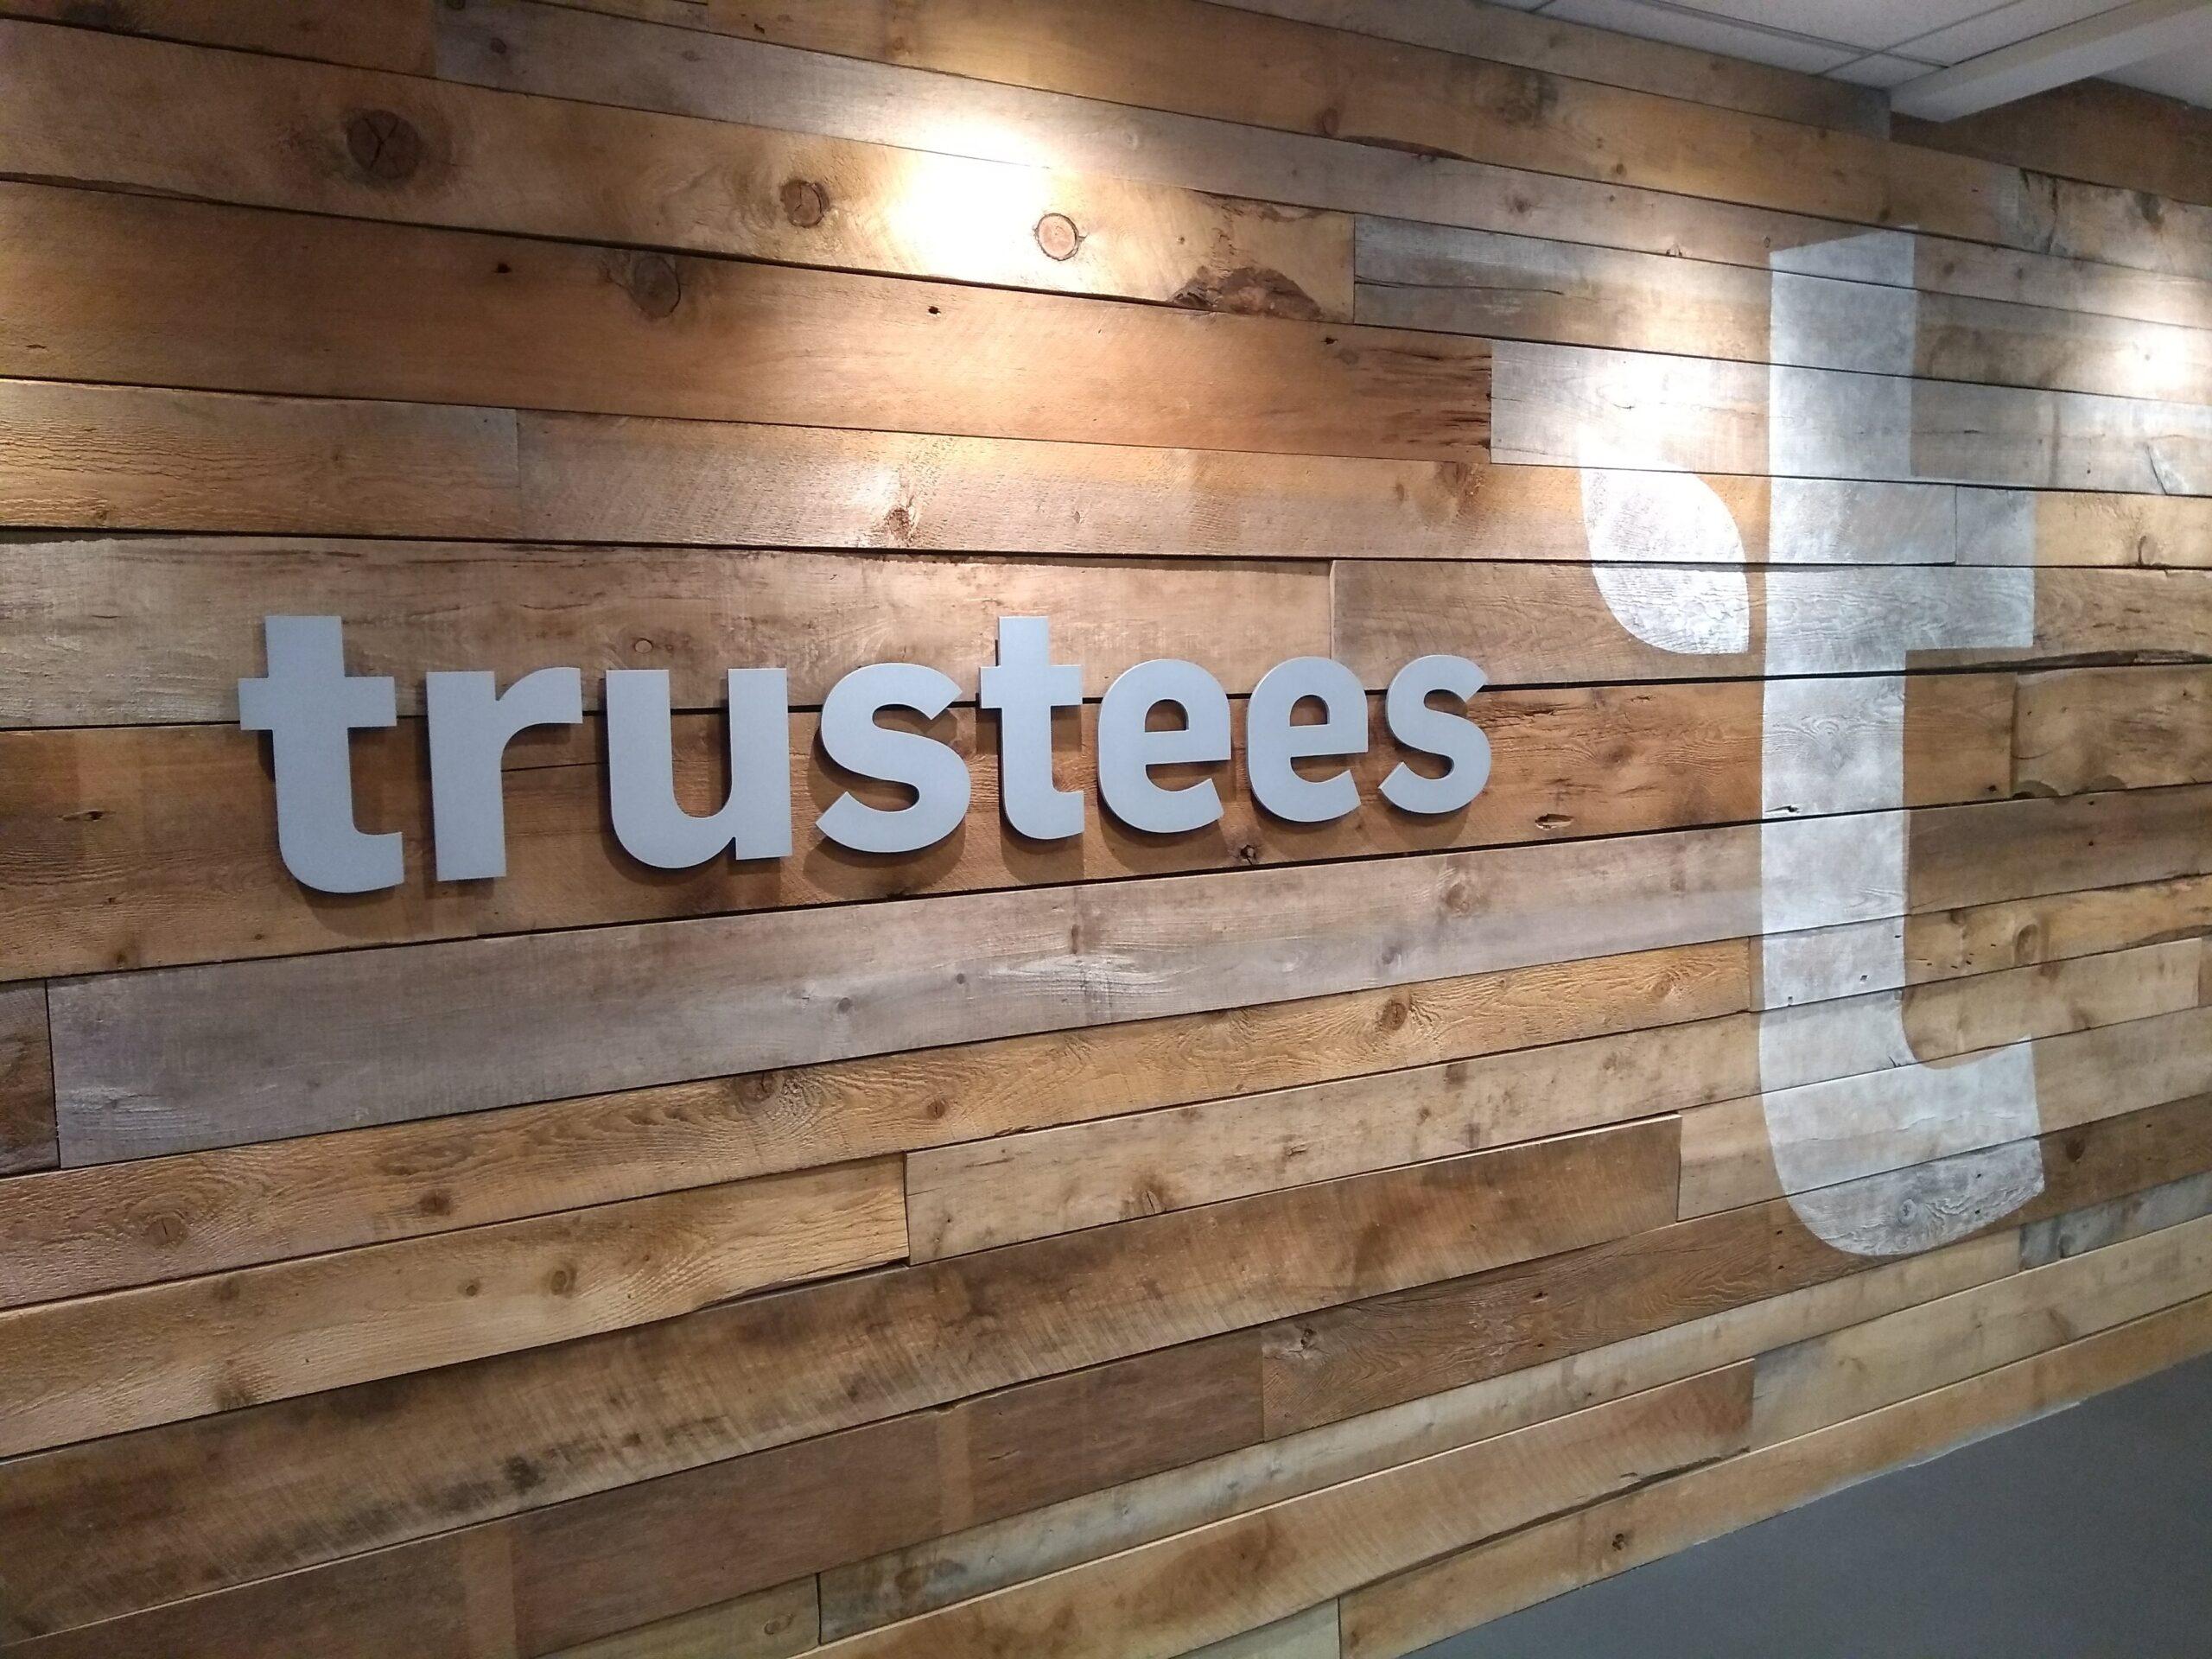 A shiplap wall in the Trustees Boston Office